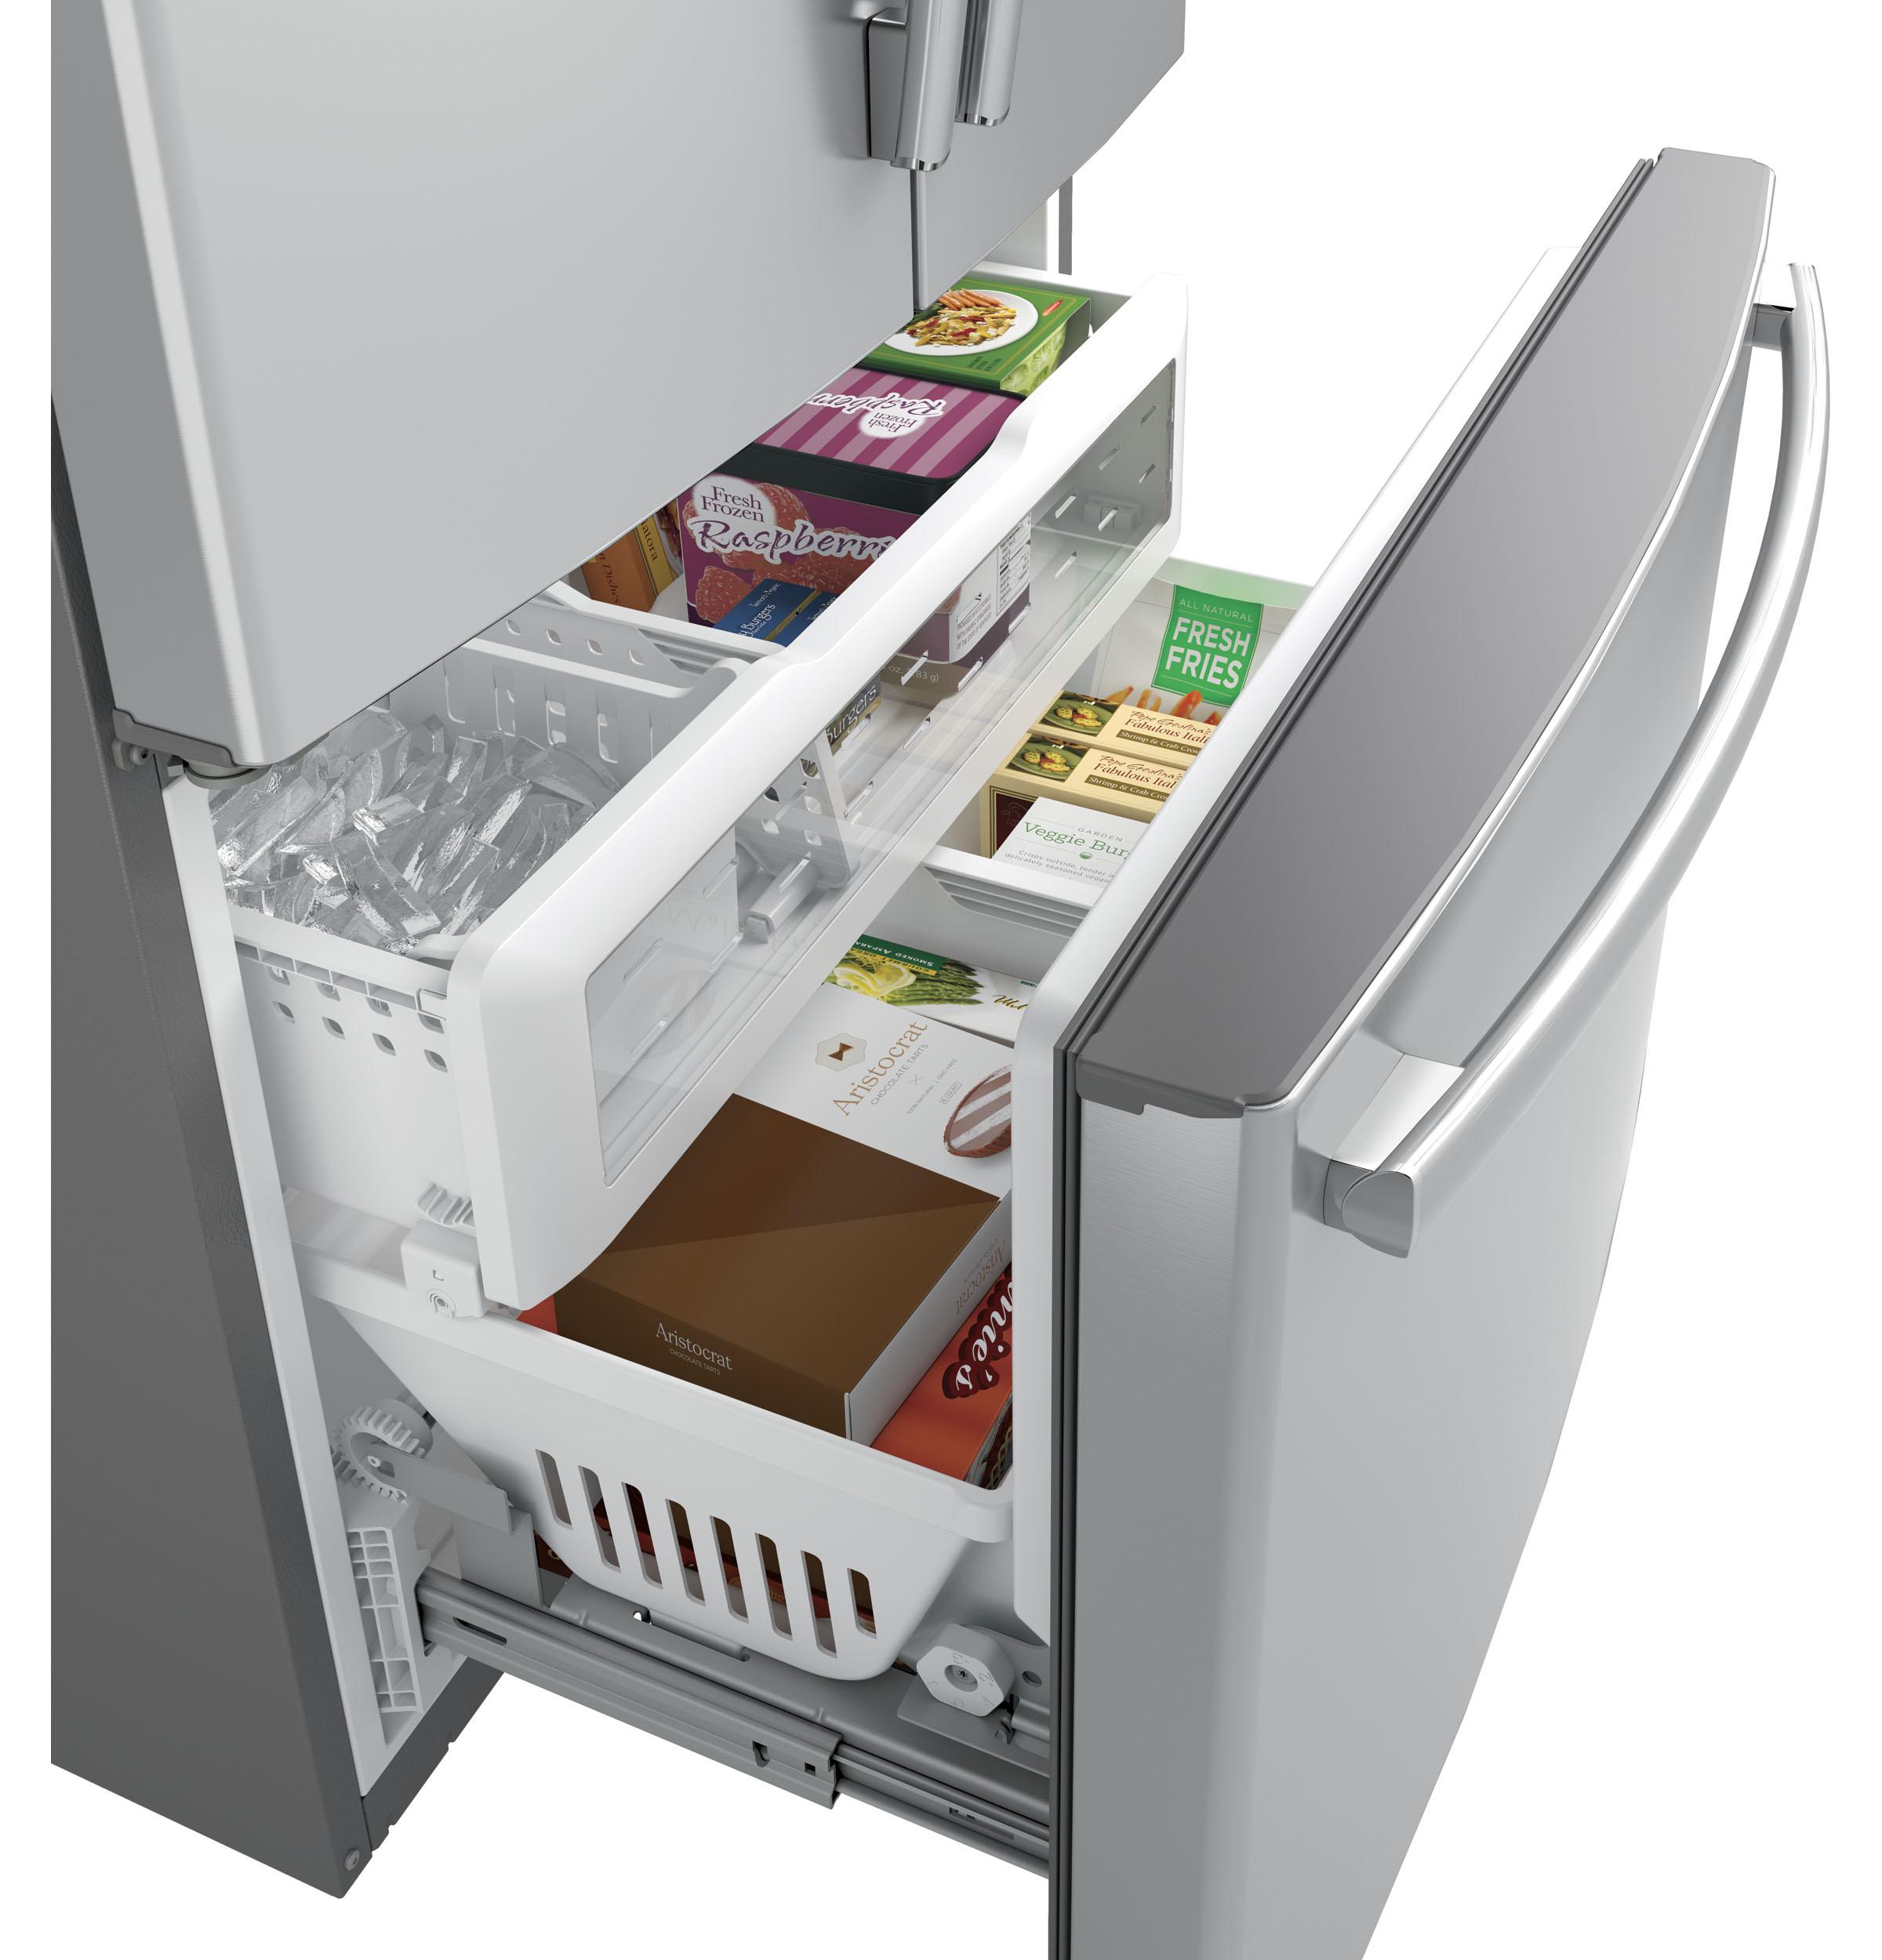 Model: PWE23KSKSS | GE Profile™ Series ENERGY STAR® 23.1 Cu. Ft. Counter-Depth French-Door Refrigerator